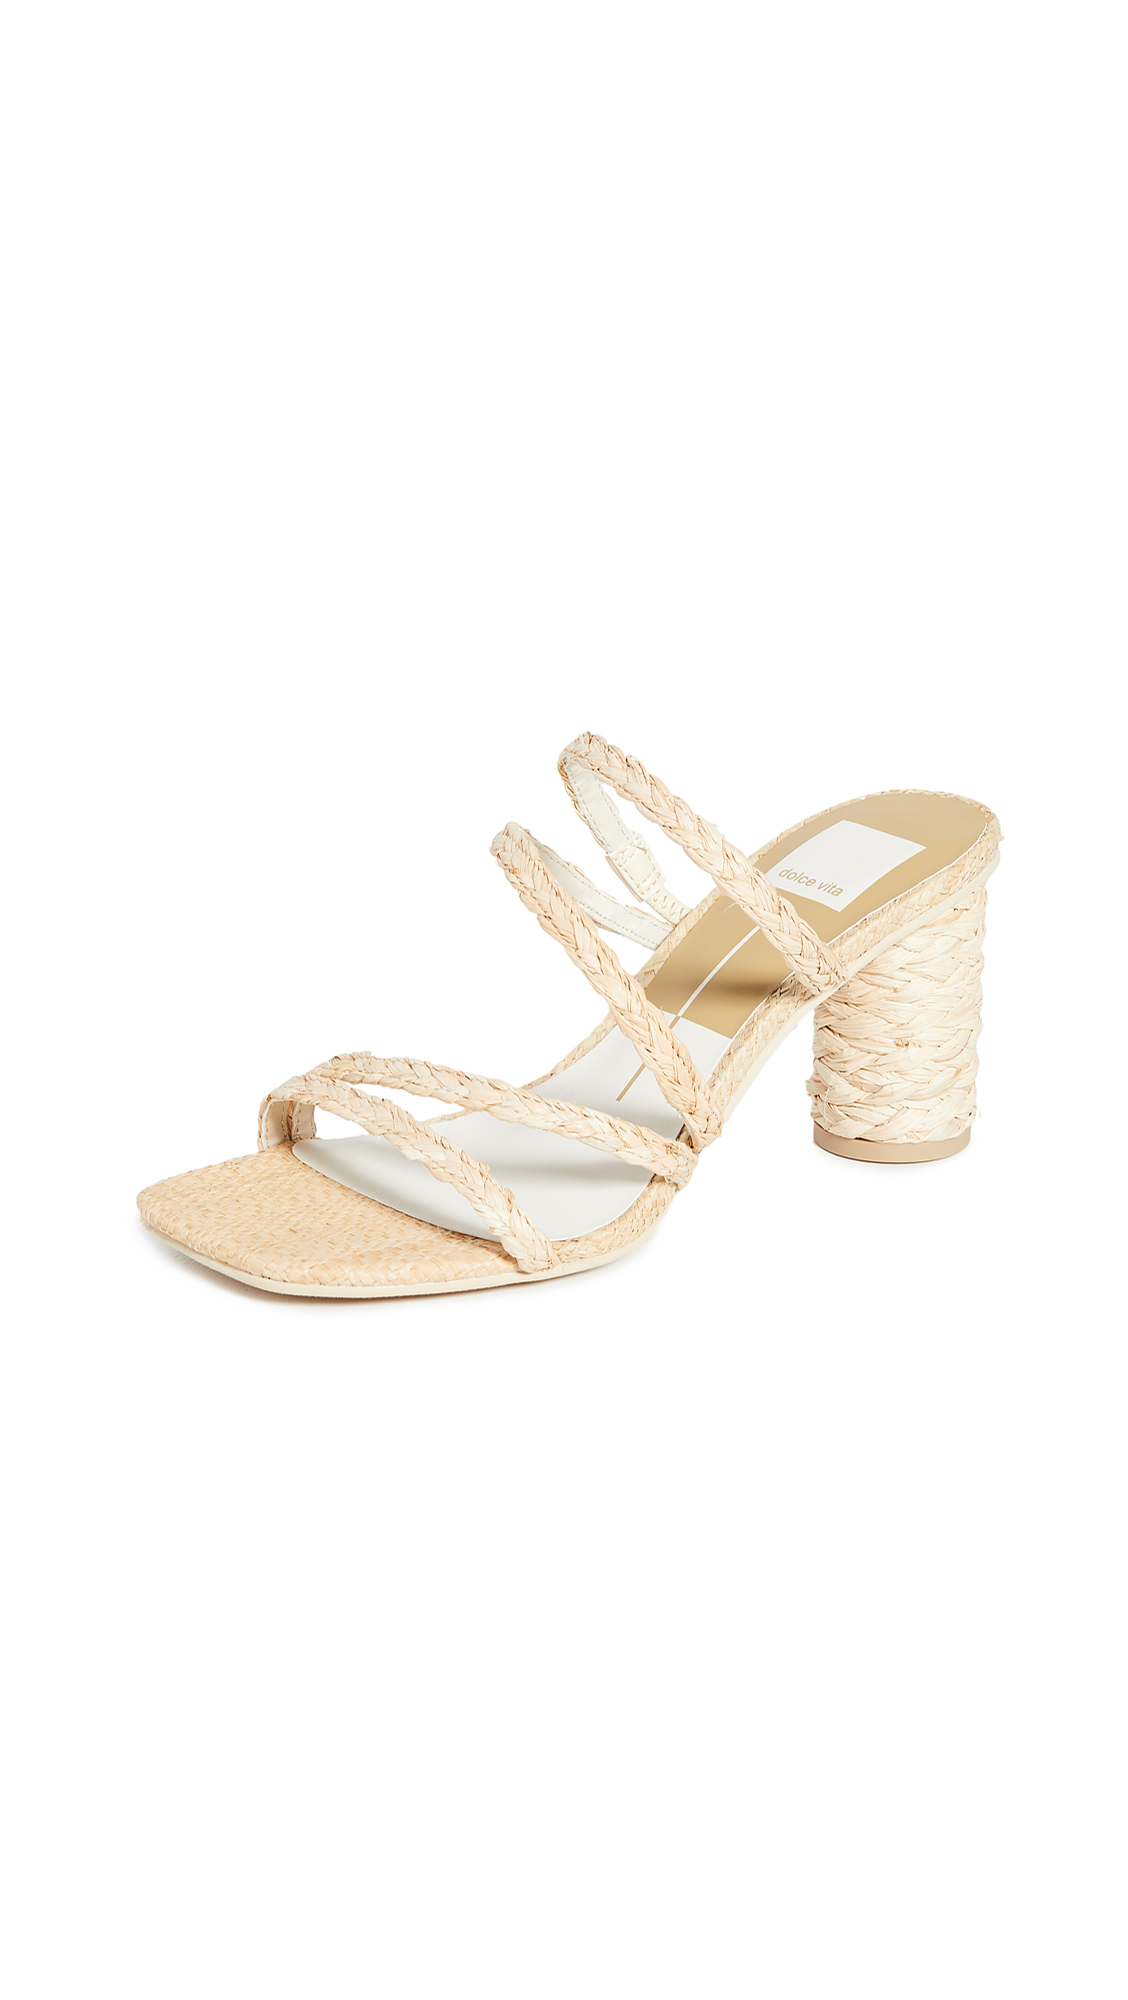 Buy Dolce Vita Nova Sandals online, shop Dolce Vita